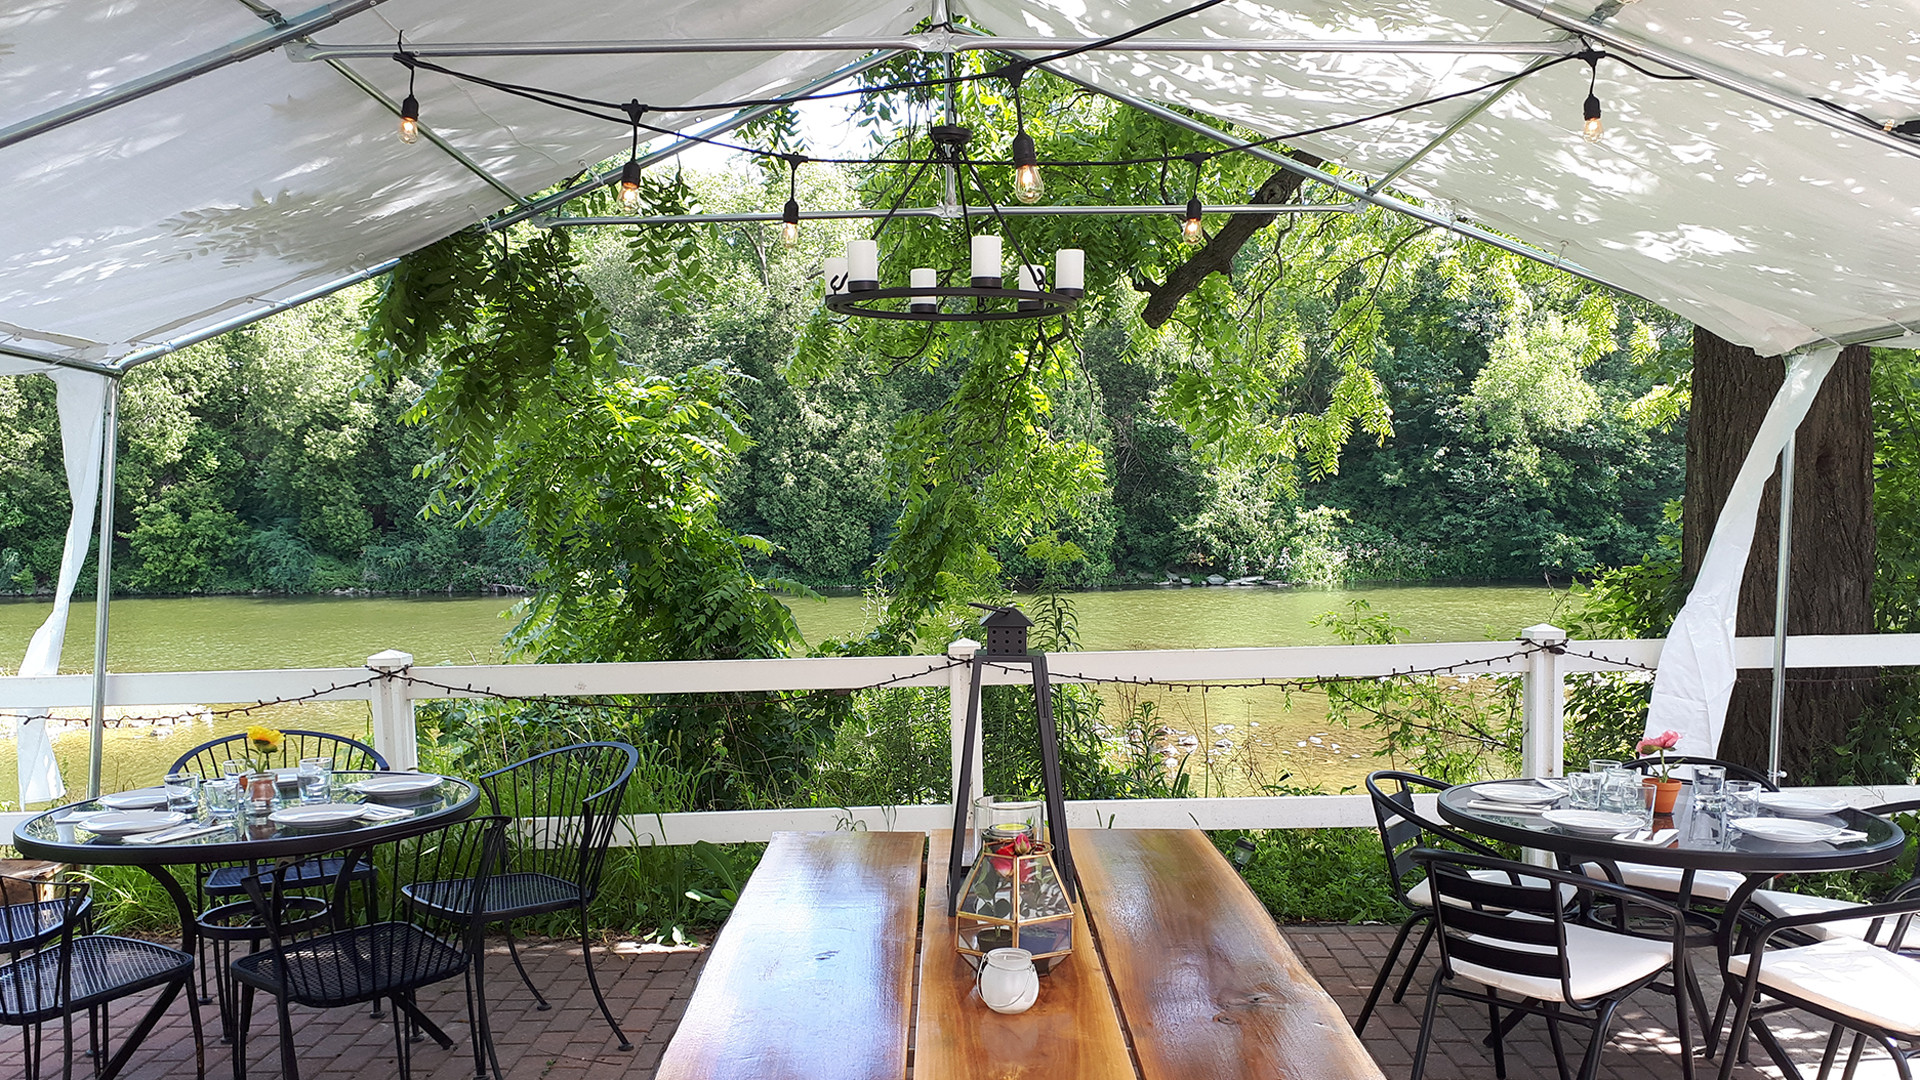 Best road trip worthy restaurants near Toronto | La Fontana in Elora, Ontario